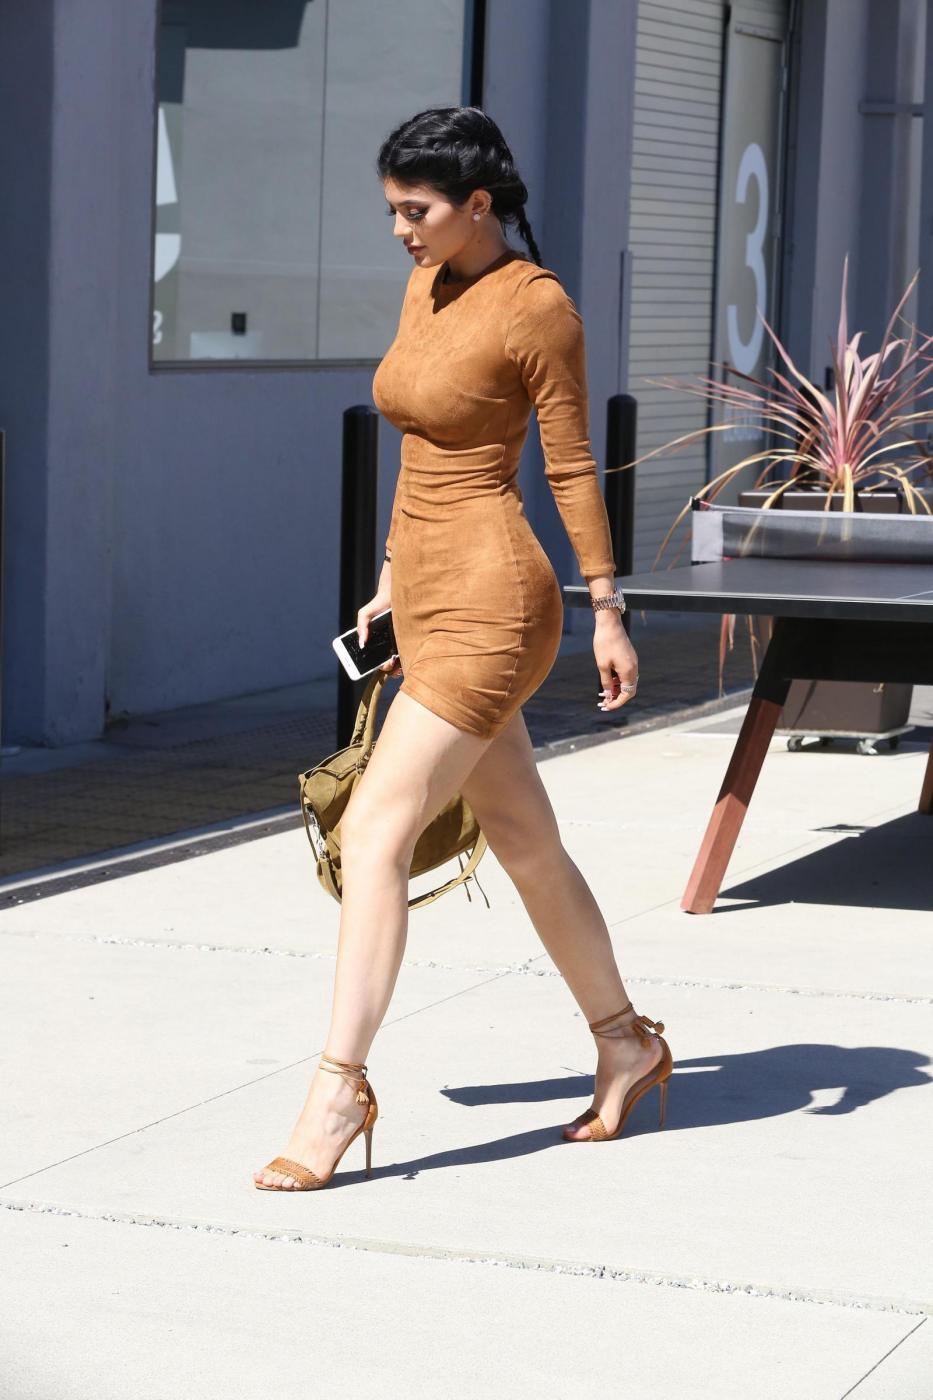 Kylie Jenner sexy: miniabito, trucco da Barbie e Ferrari9